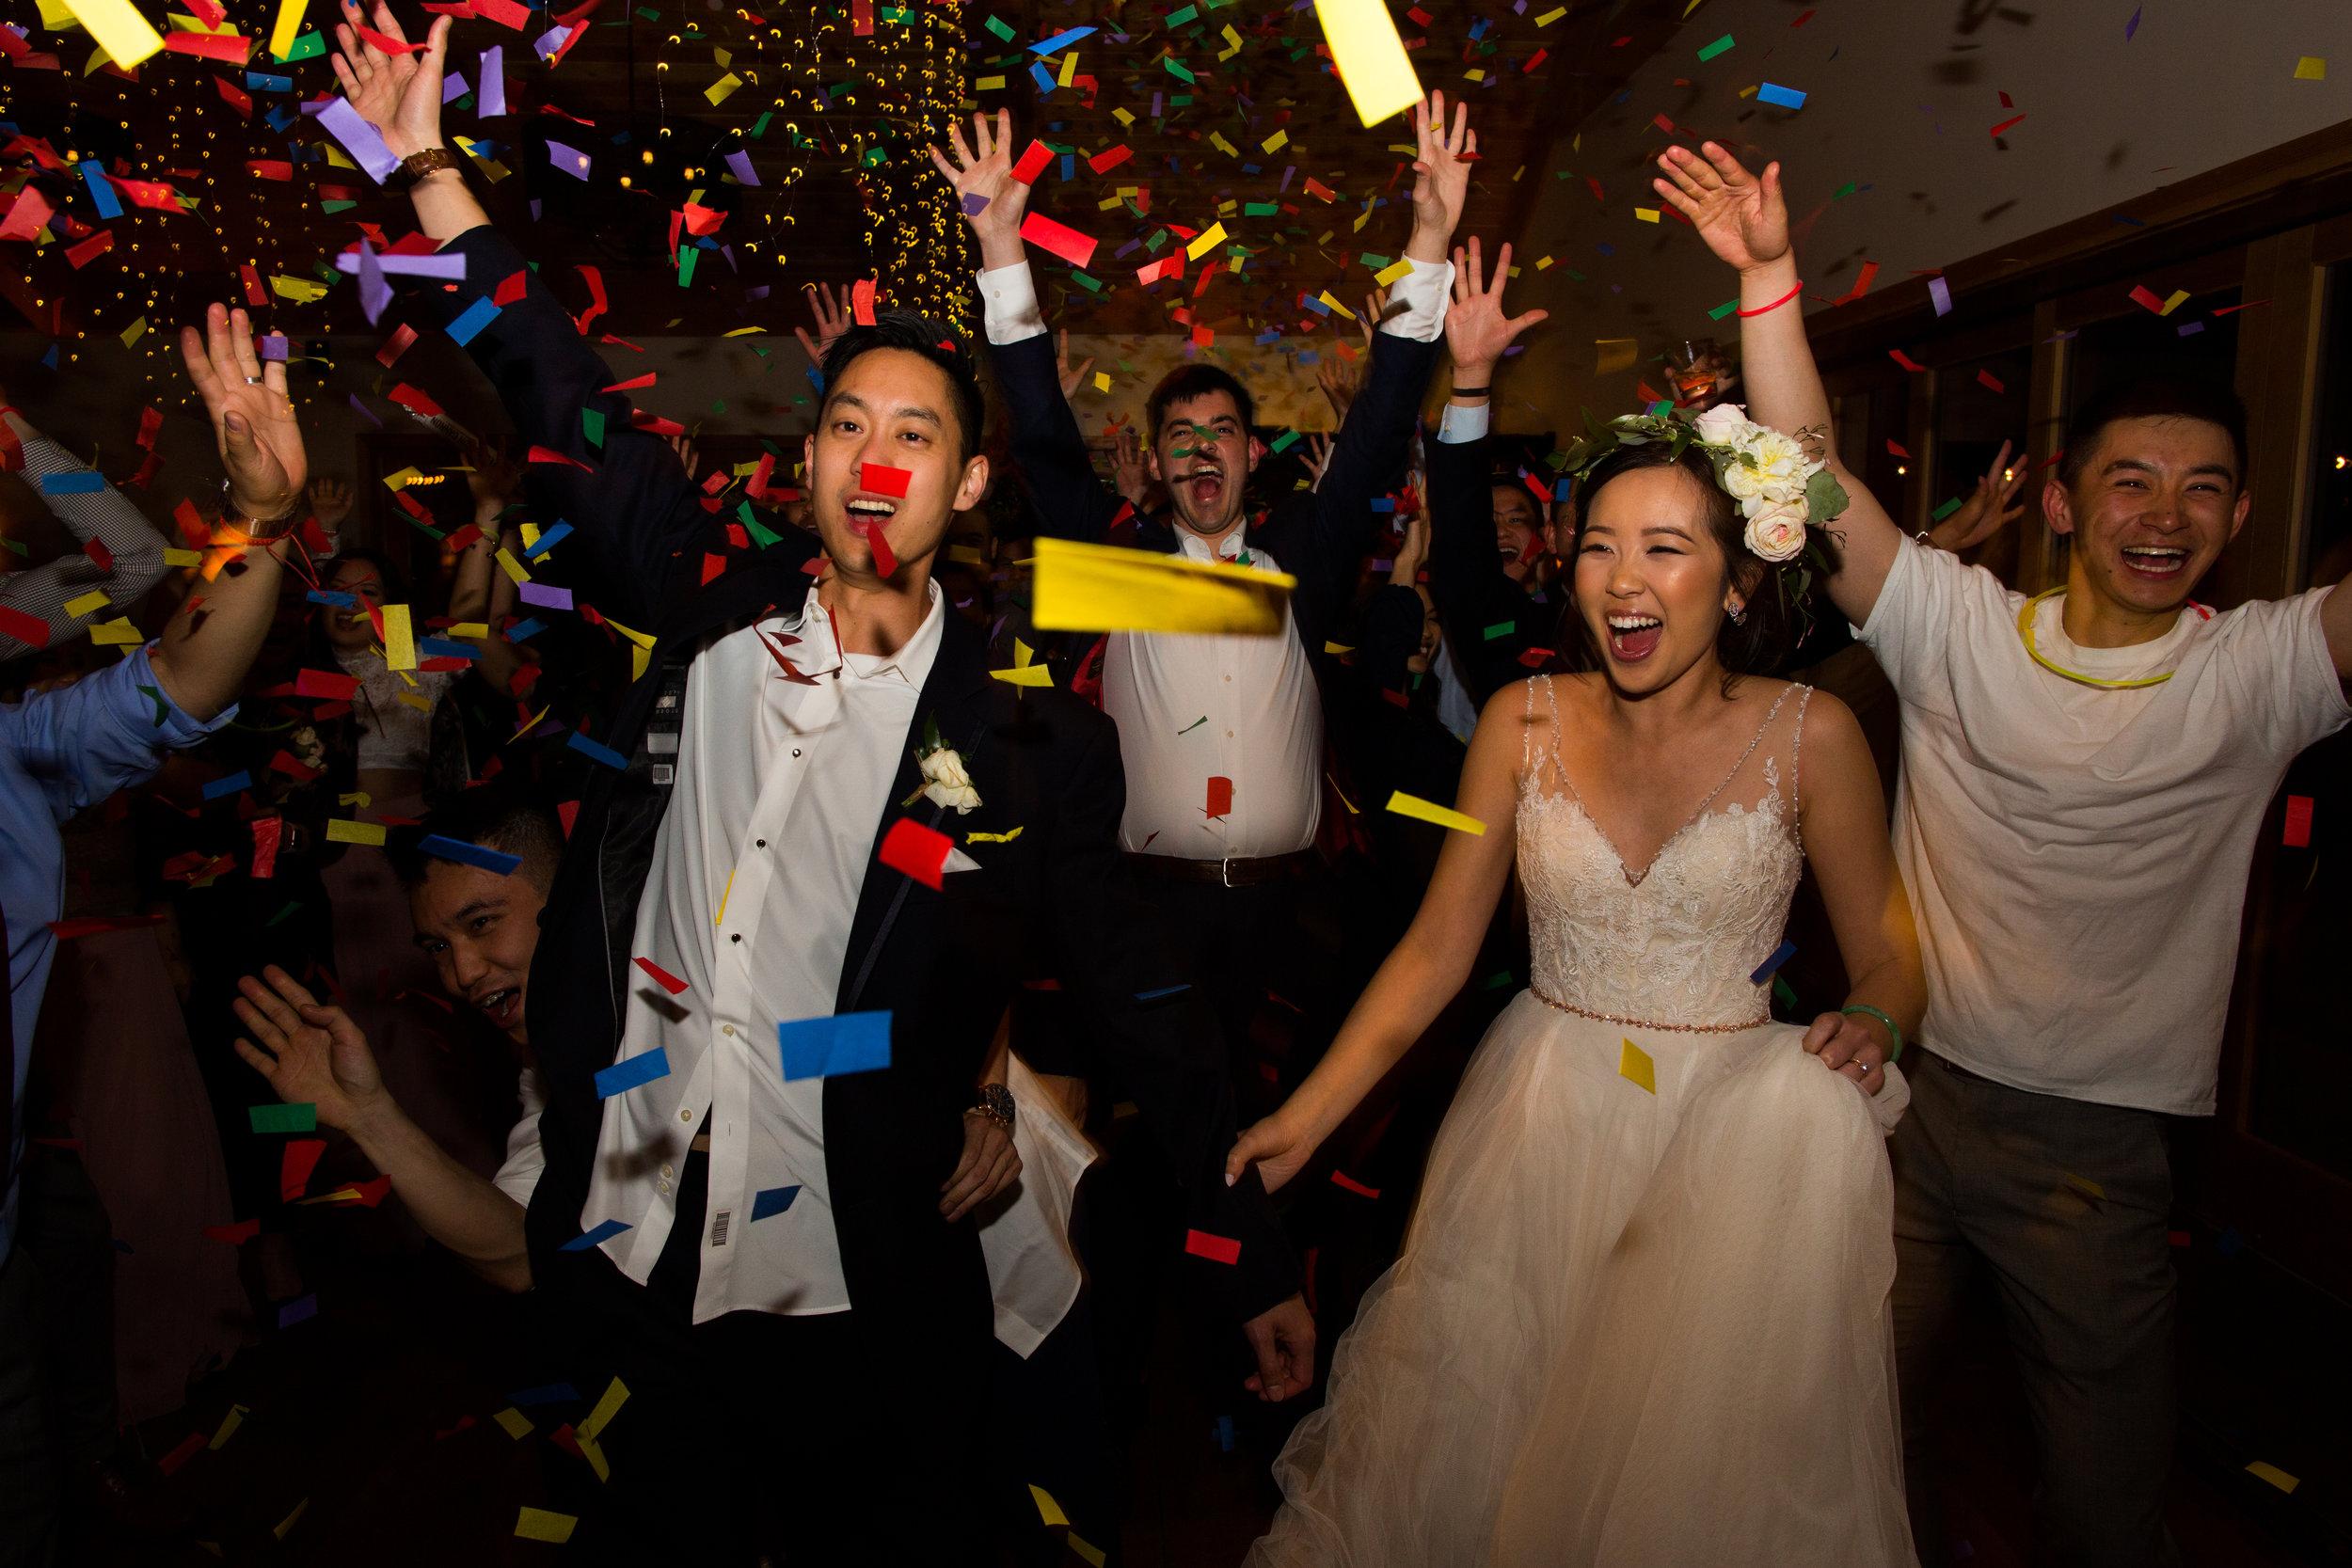 rush creek lodge wedding reception-93.jpg